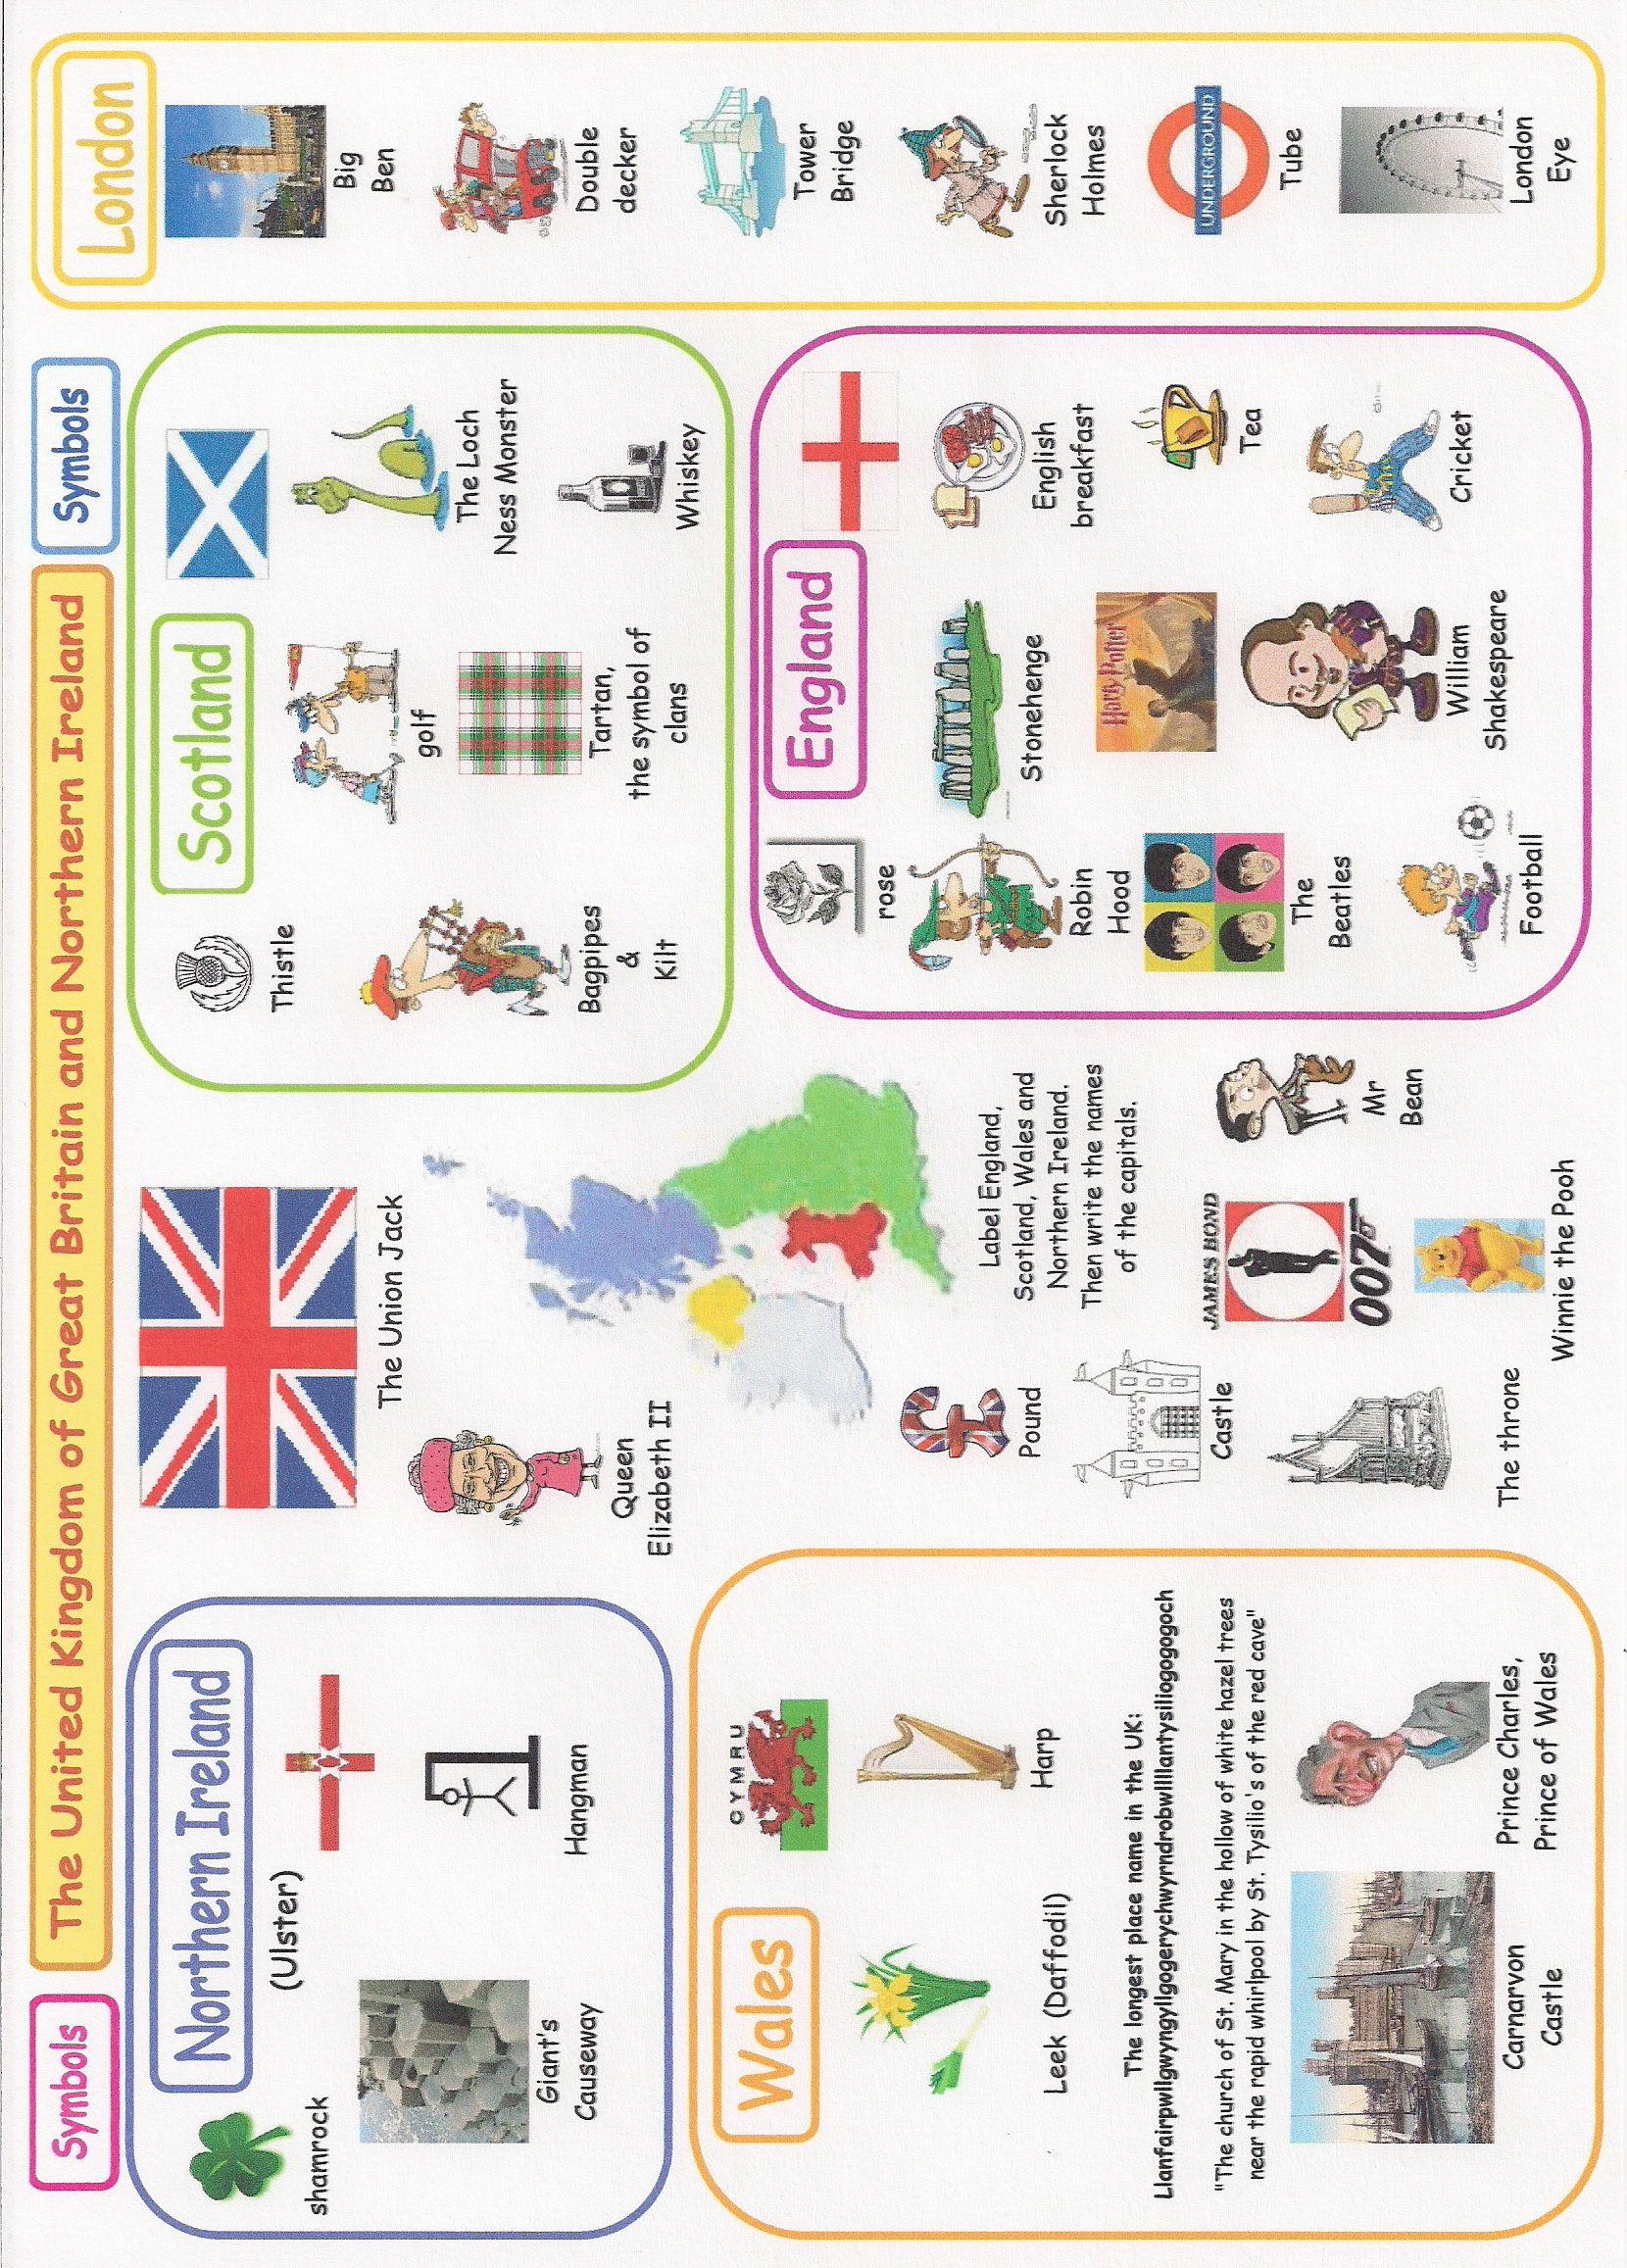 uk symbols elt country study pinterest anglais 6 me anglais enfant and exercice anglais. Black Bedroom Furniture Sets. Home Design Ideas